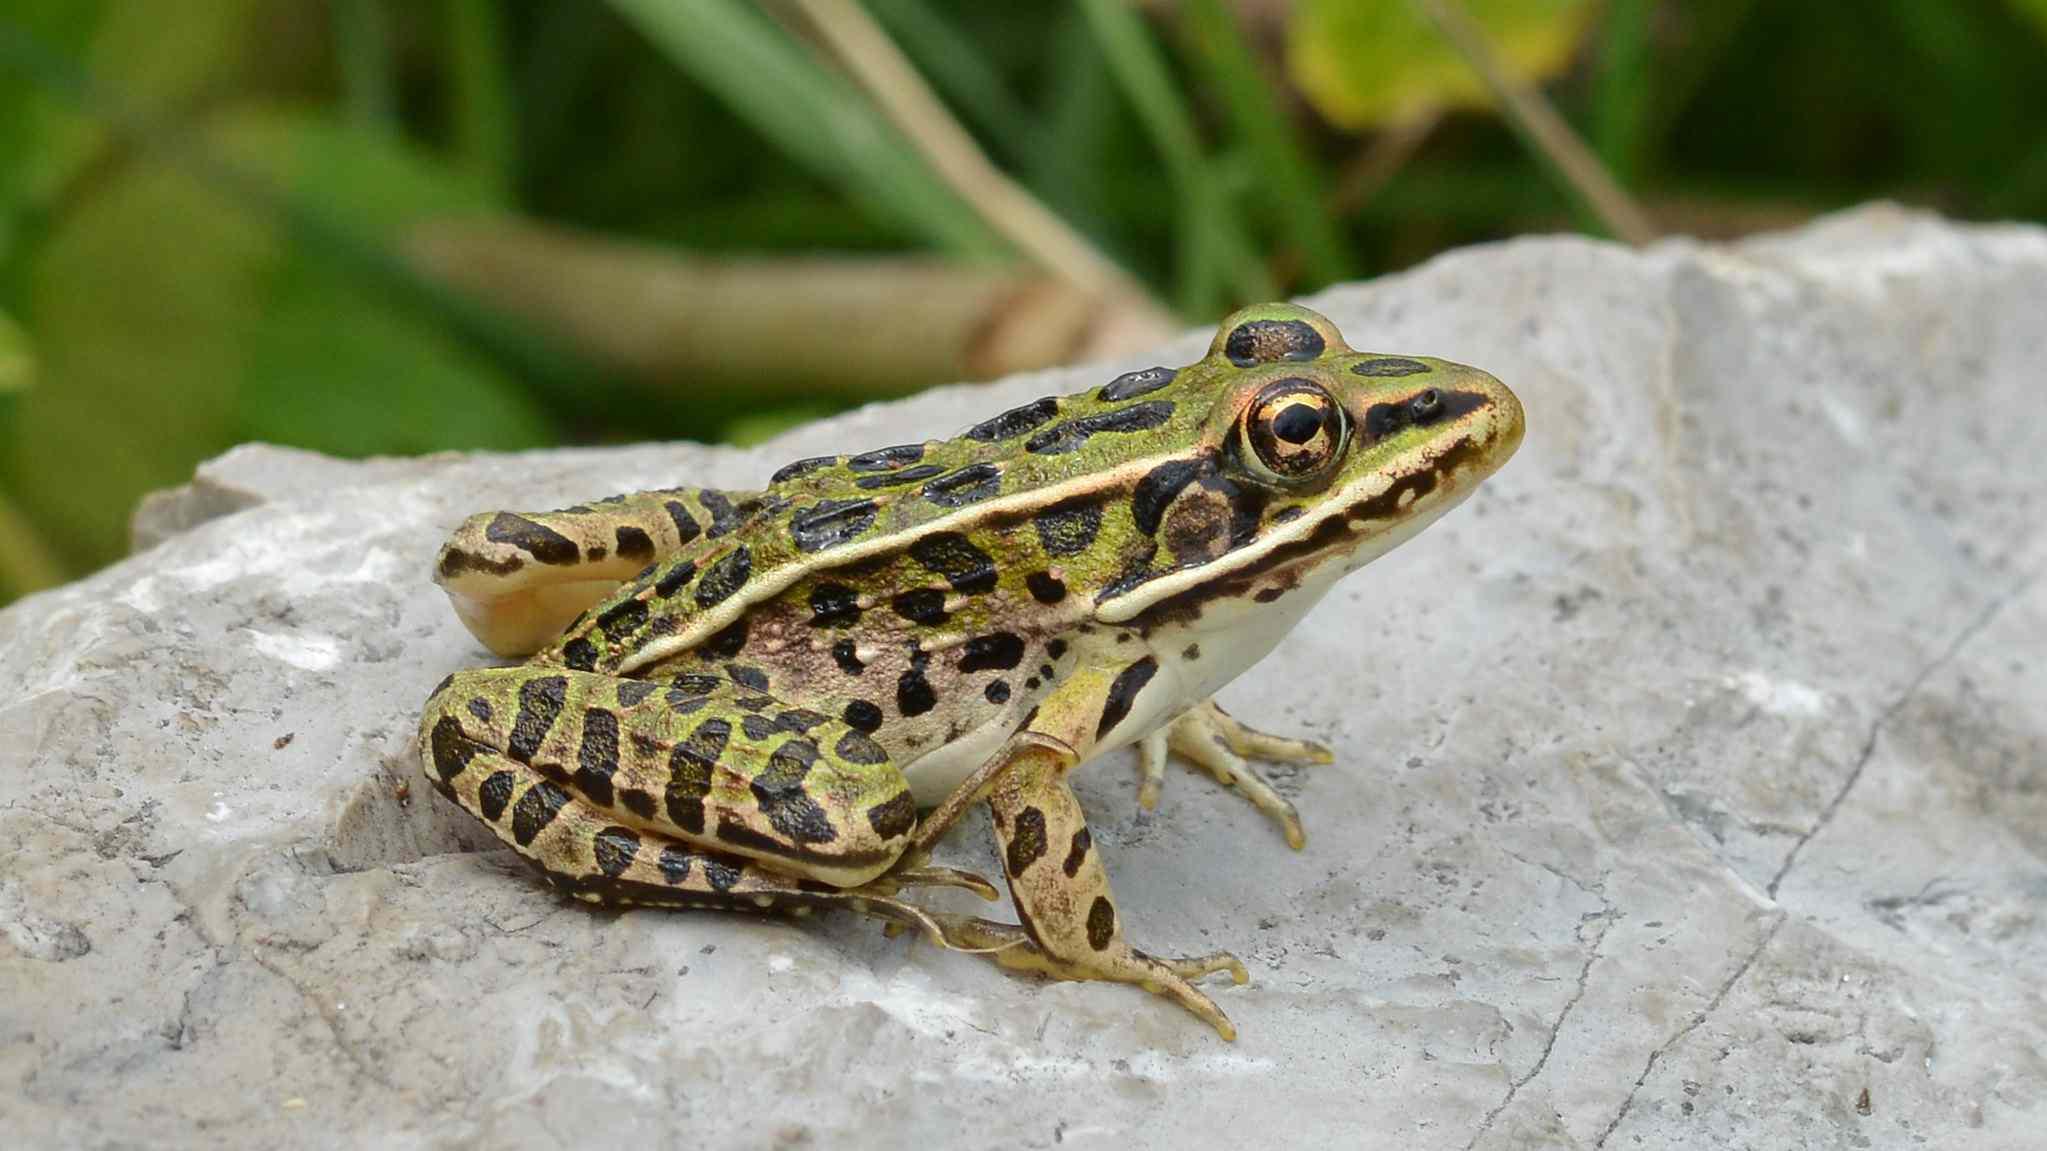 Leopard frog sitting on a rock.